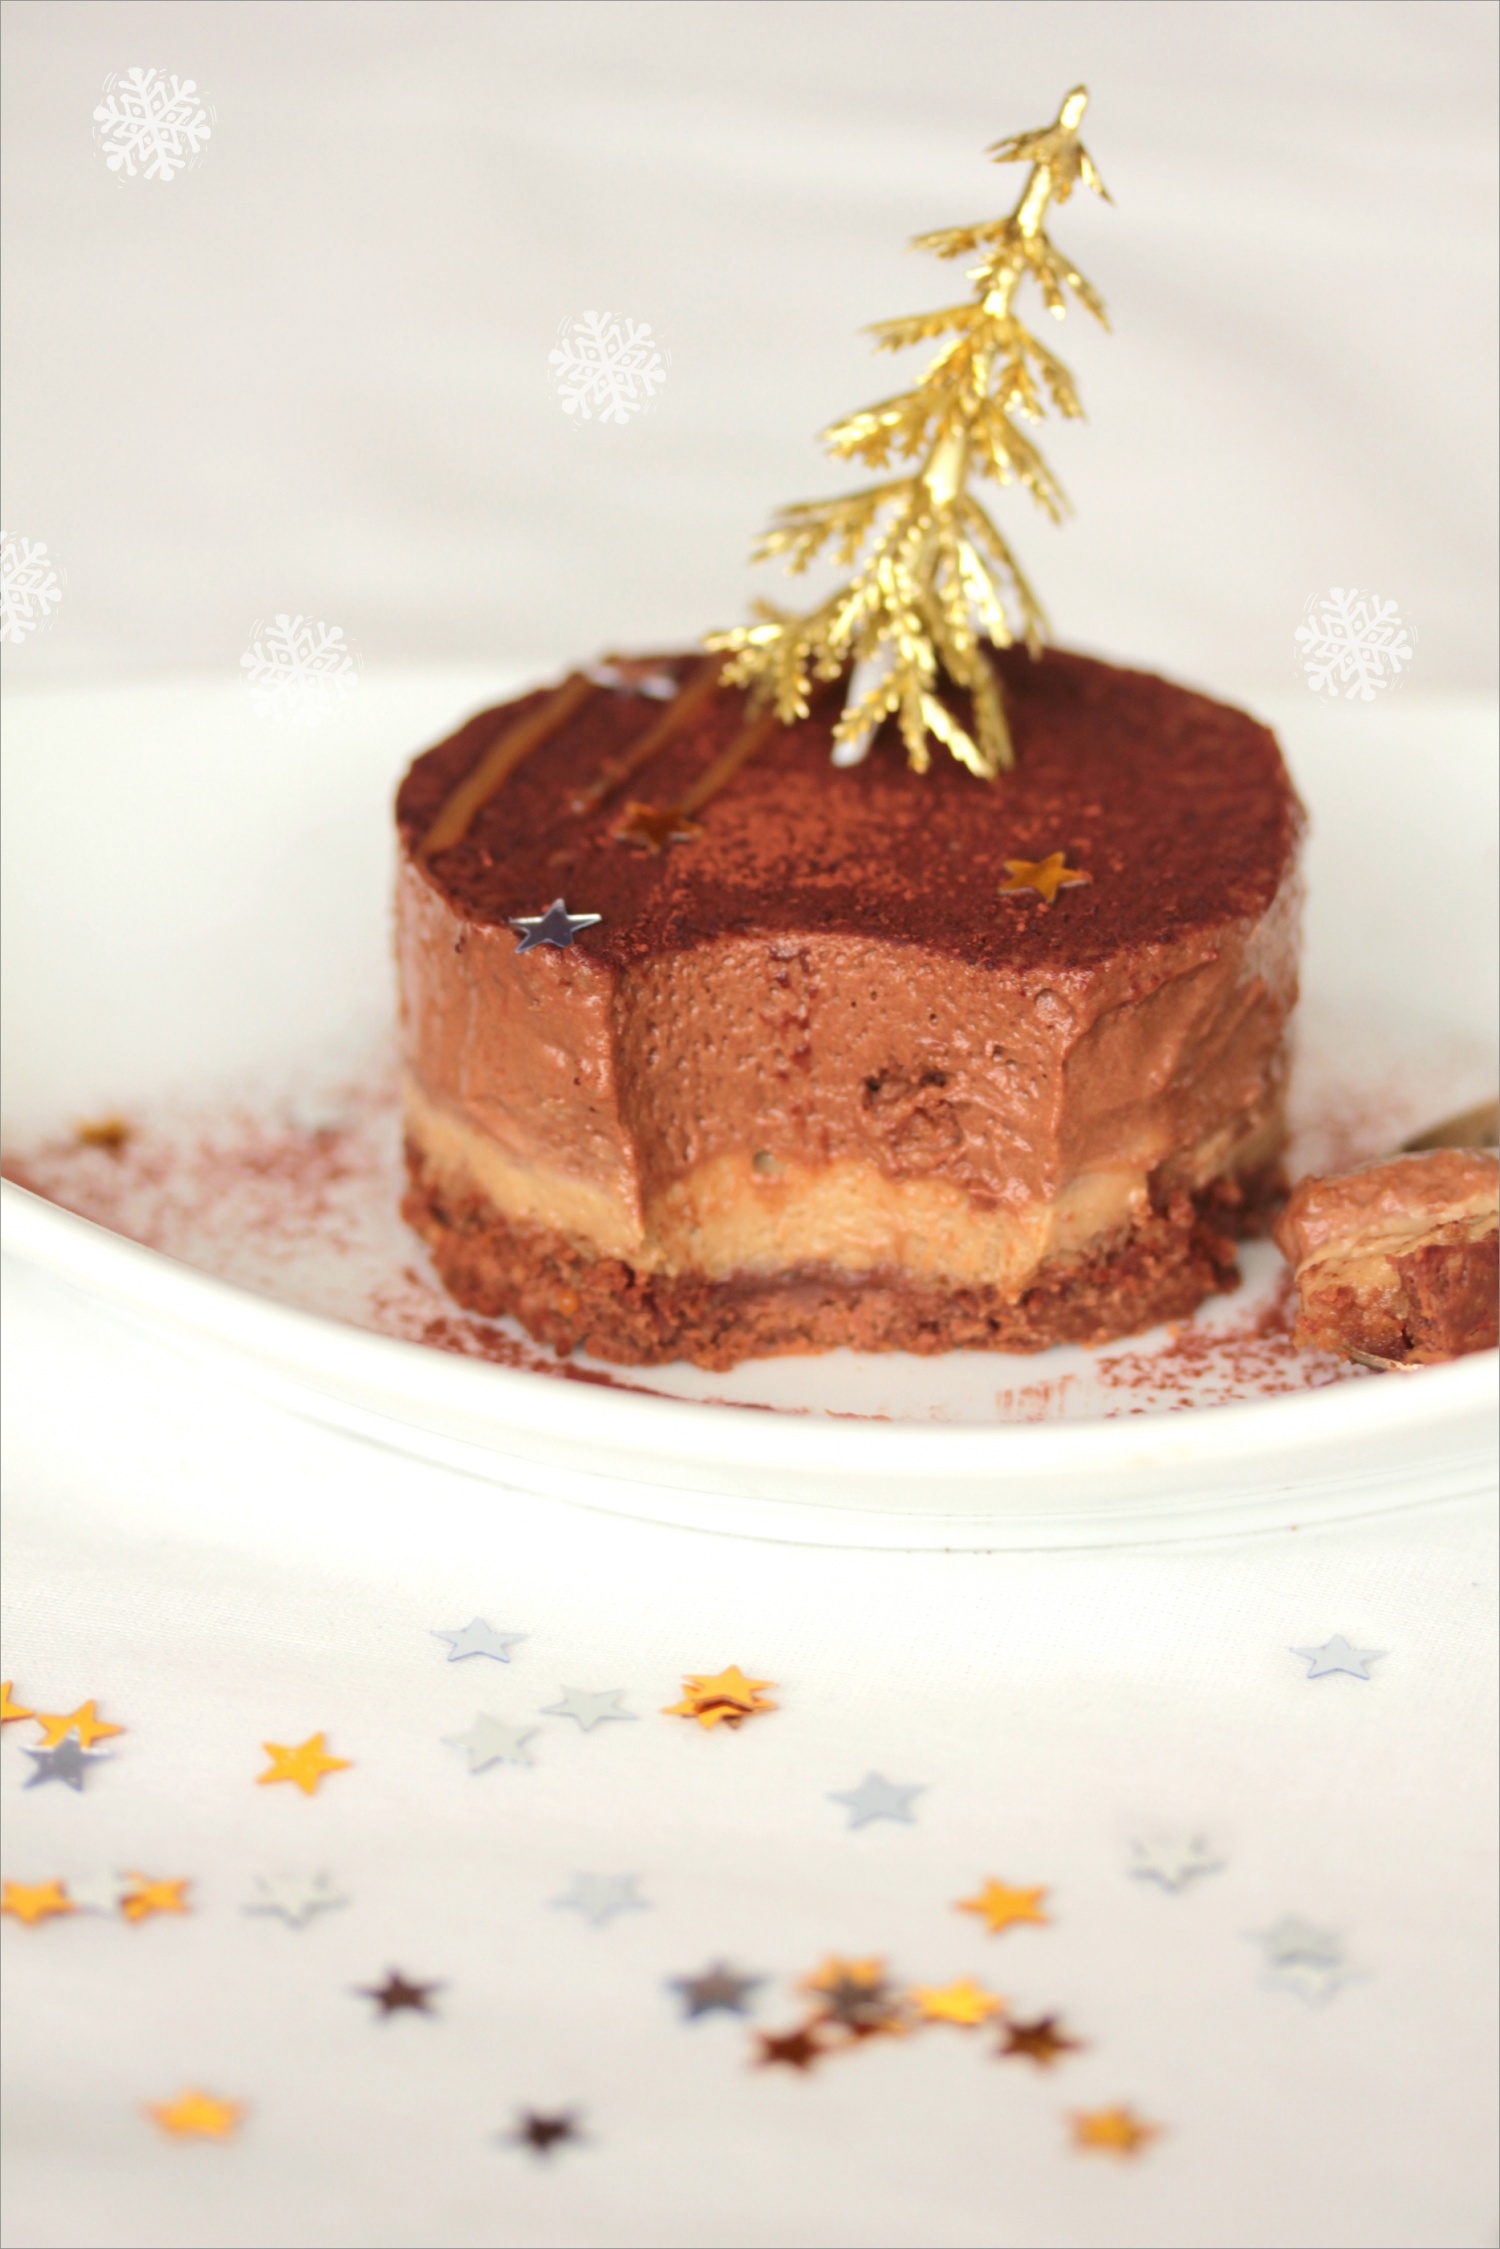 Recette gateau chocolat feuilletine praline